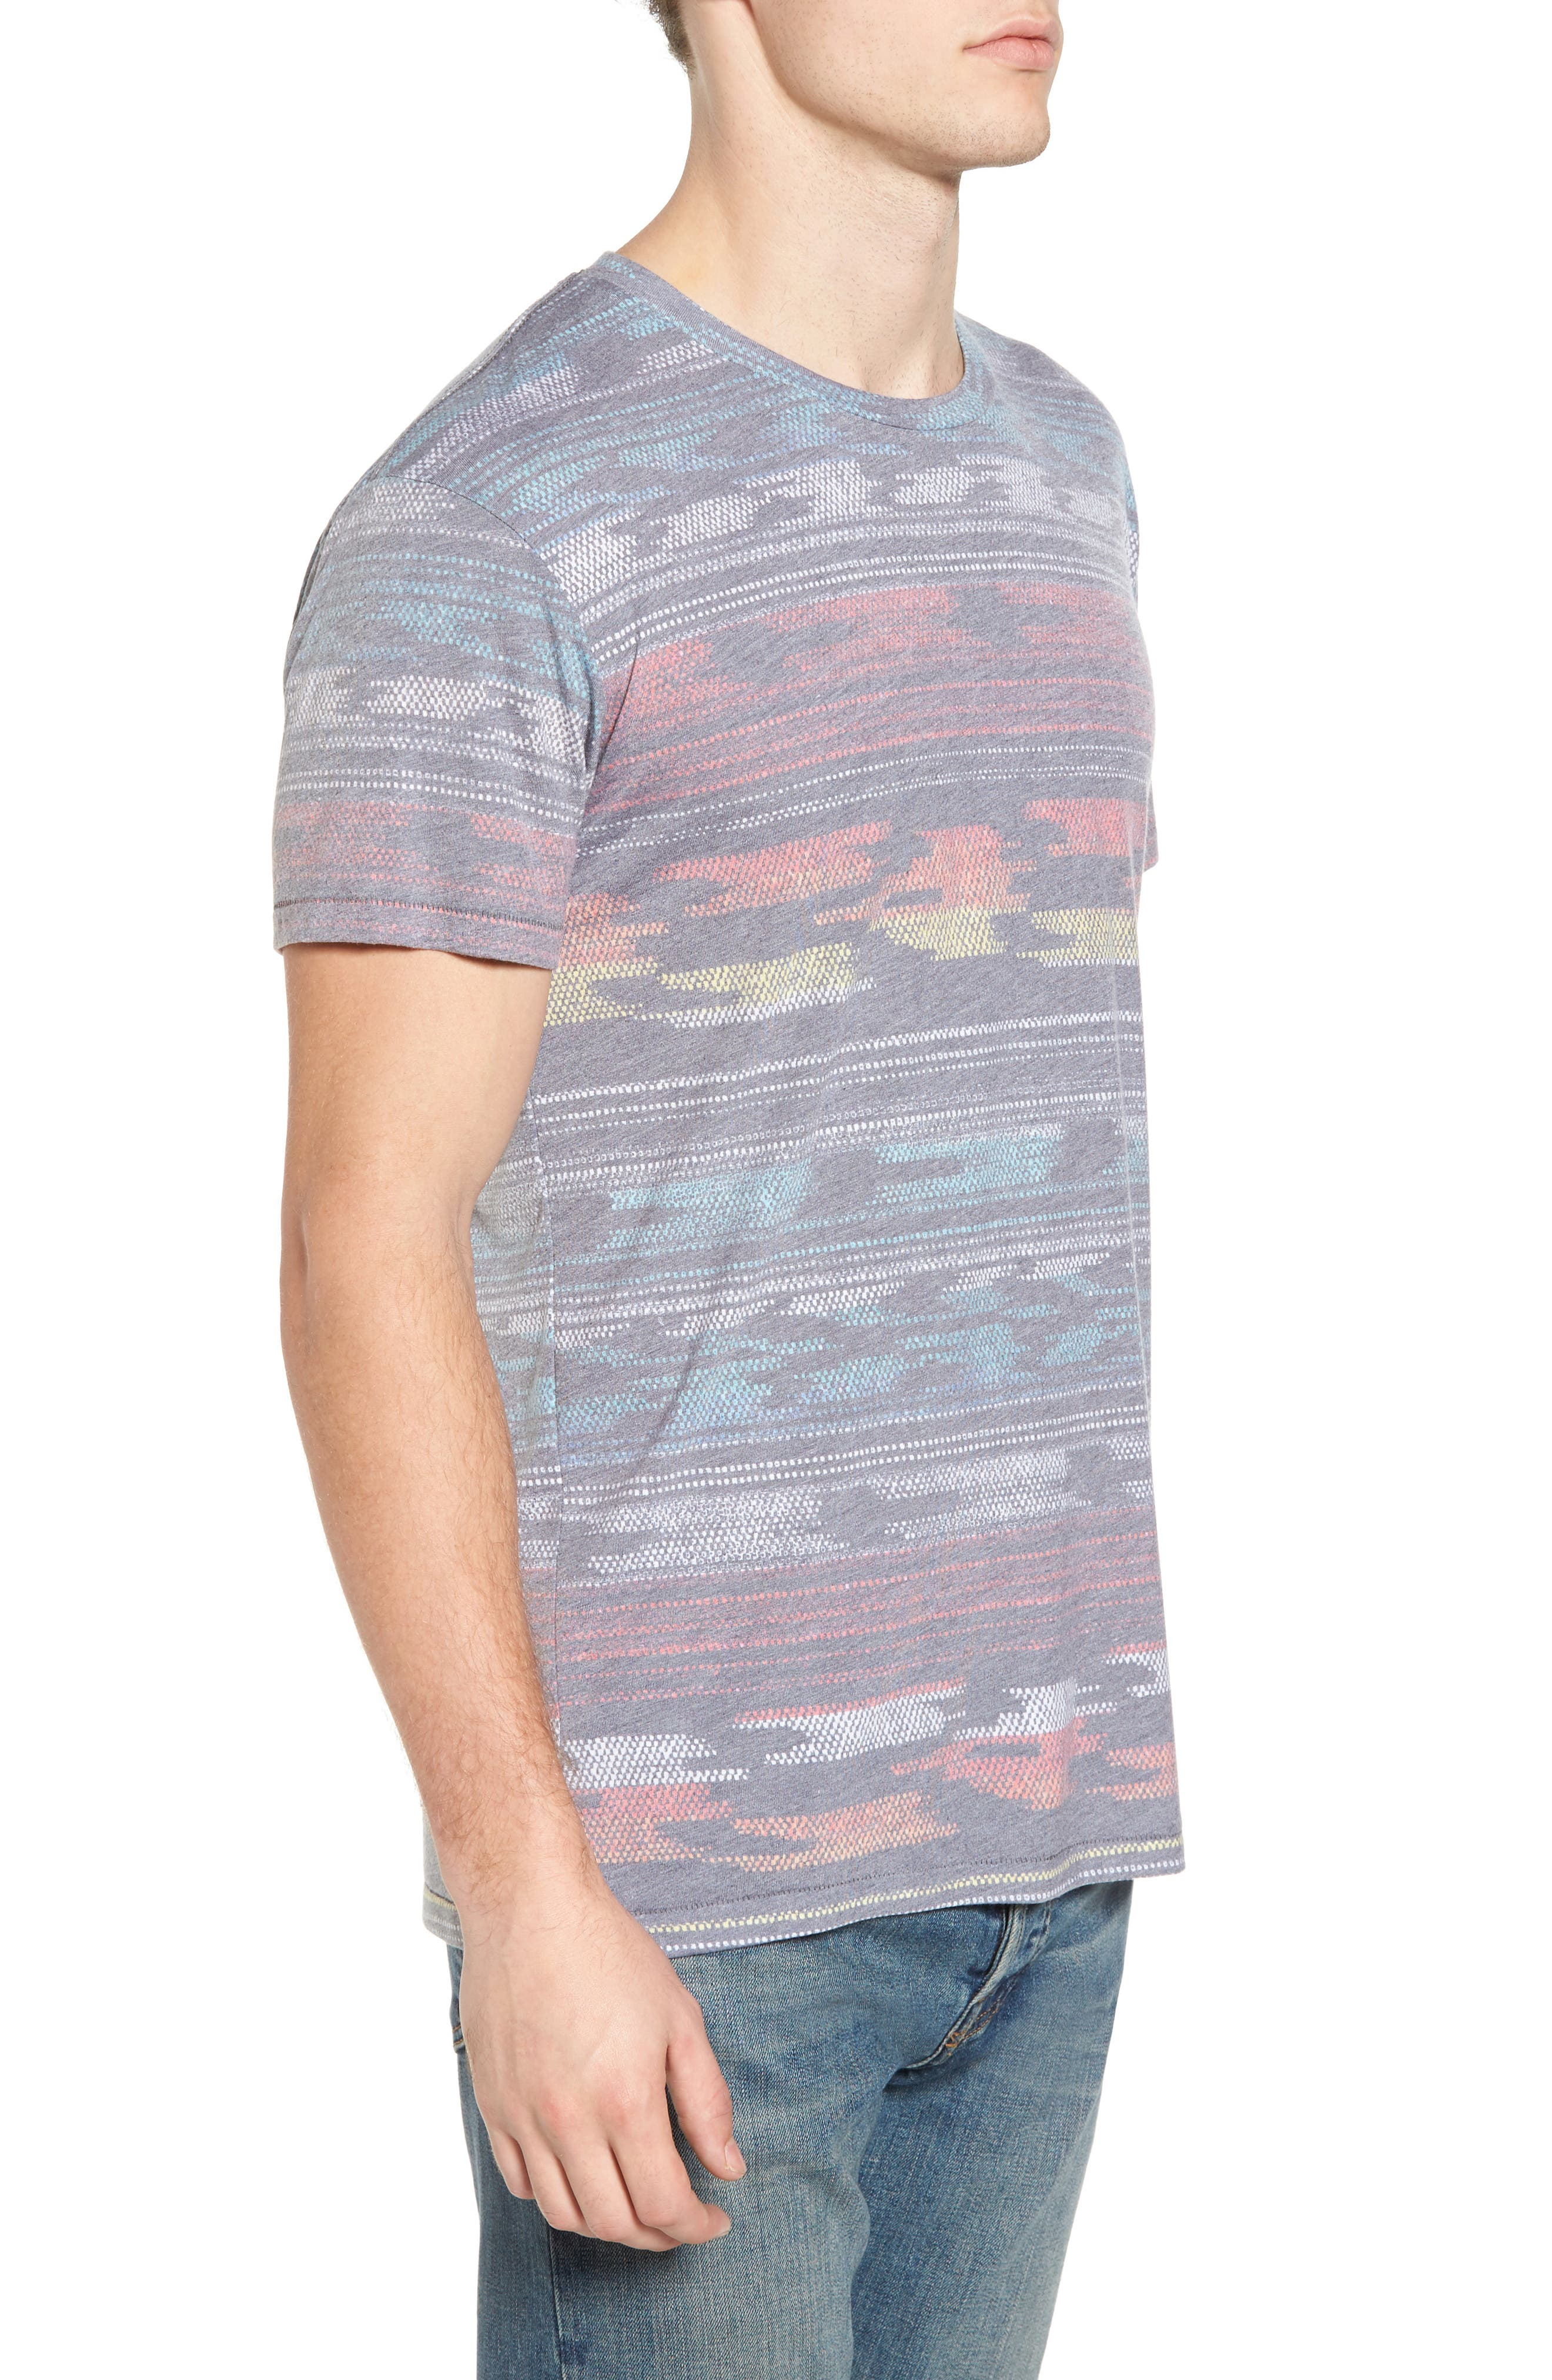 Madrugada T-Shirt,                             Alternate thumbnail 3, color,